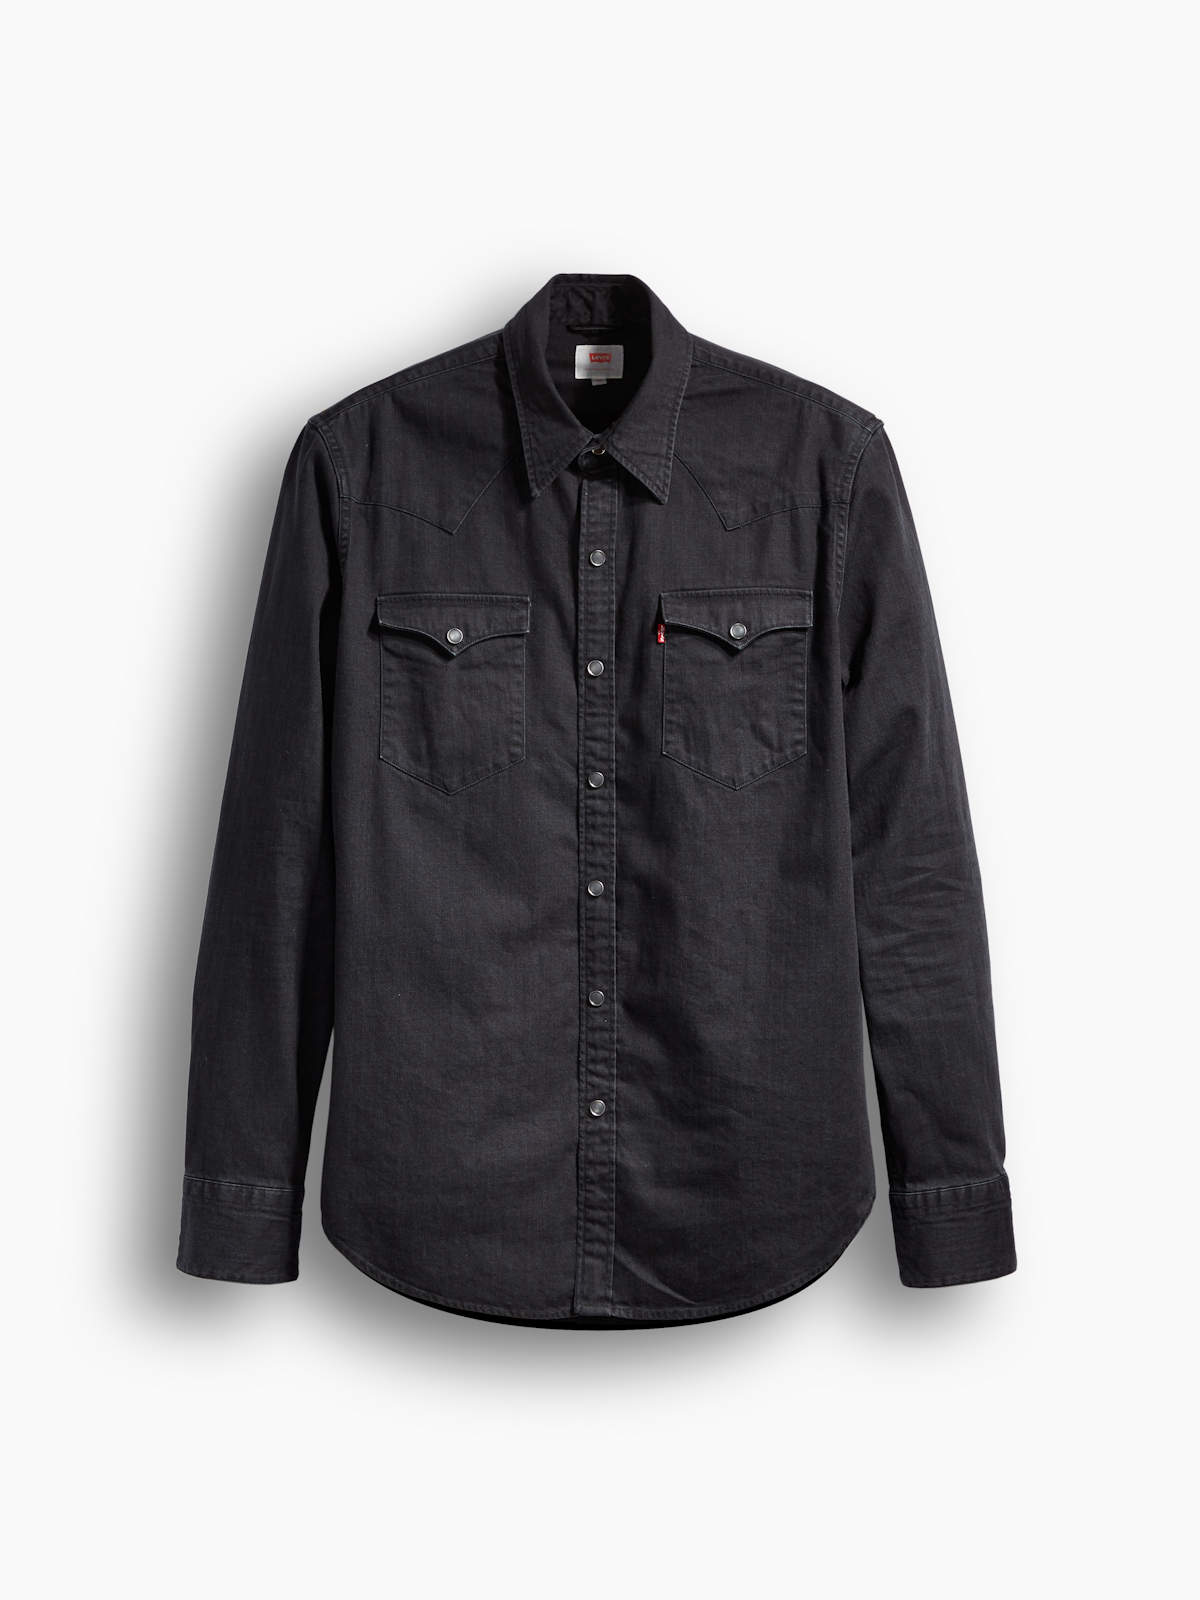 Barstow Denim ® 0216 Herren Hemd Black 65816 Levis Jeans Western xtP0U0wq